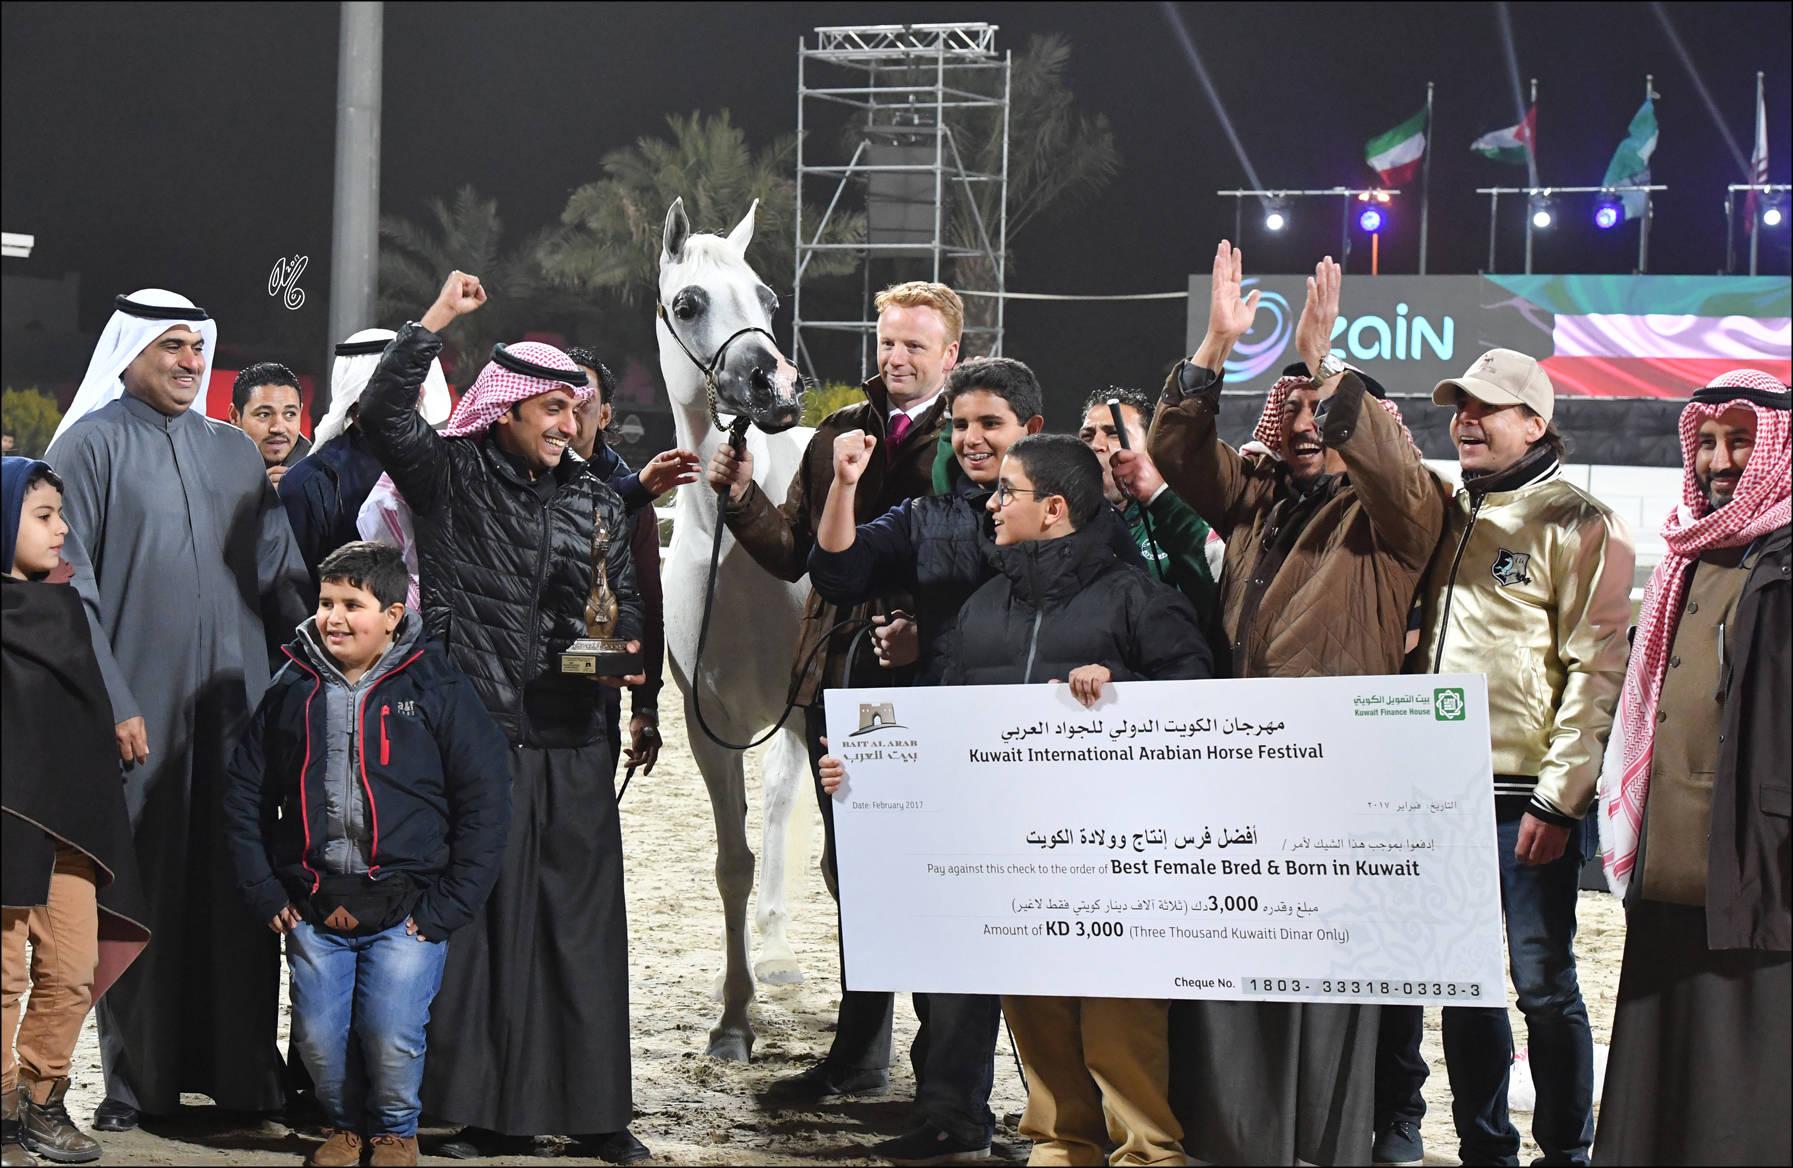 Best SE Arabian Female bred and born in Kuwait: Shalwa (Sinan Al Rayyan X Al Galyla), who was bred by Essam Al Roumi and is owned by Aldanat Stud